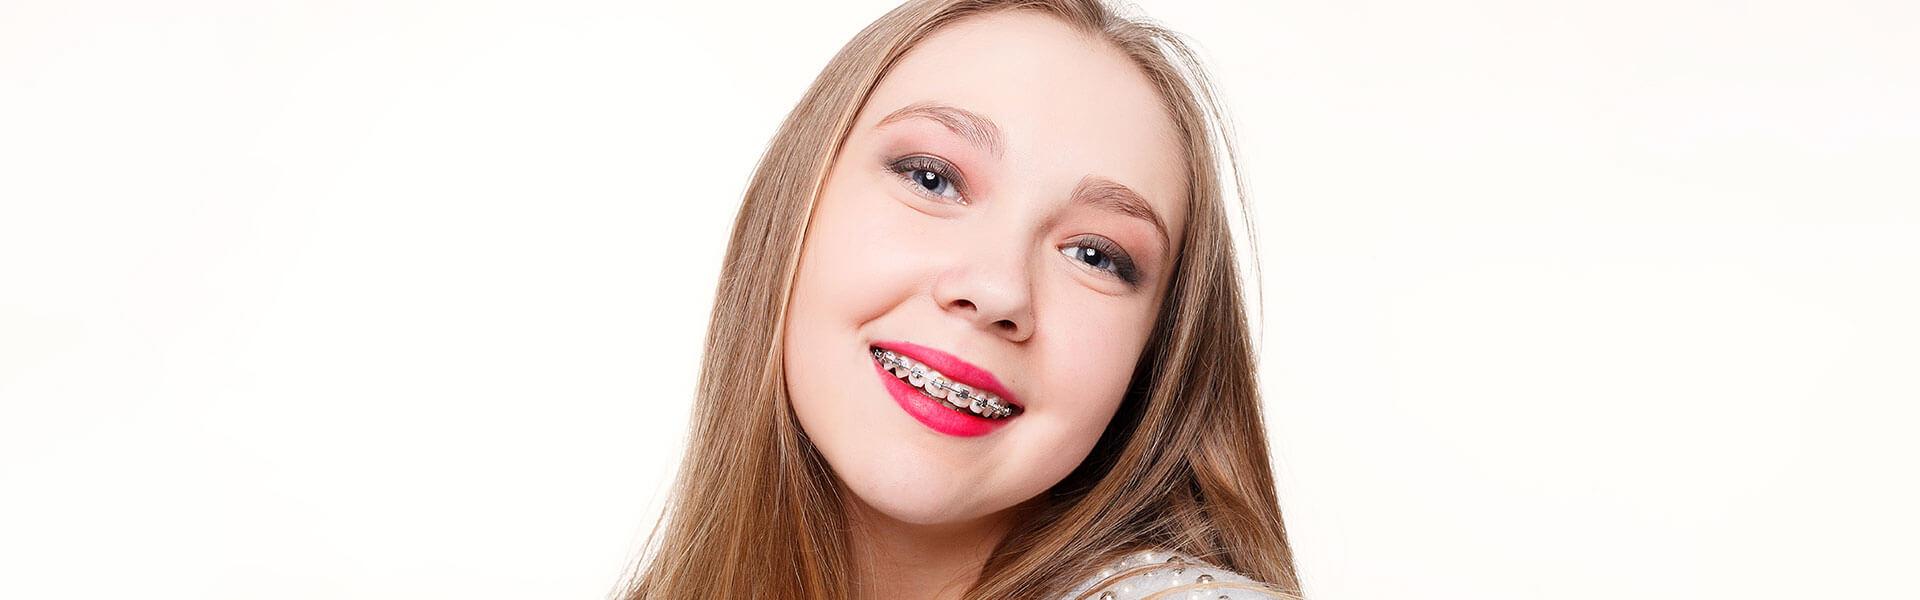 Fast Facts on Interceptive Orthodontics